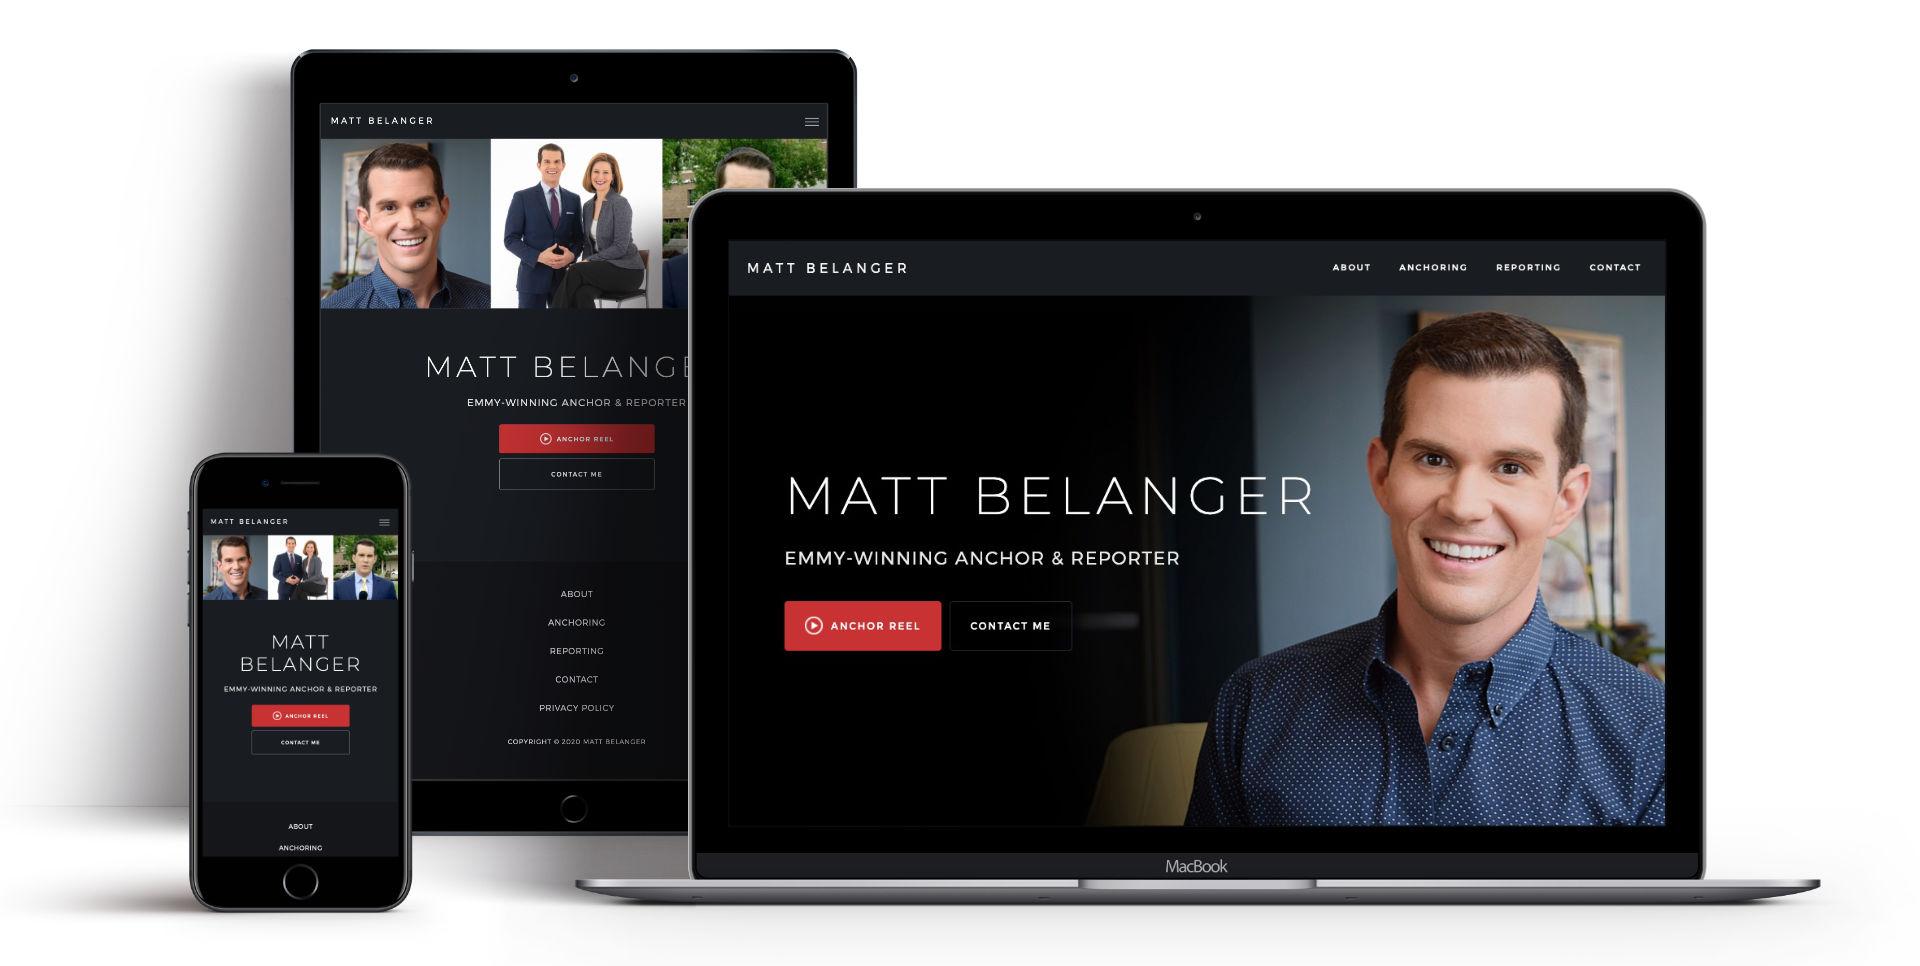 Matt Belanger's website on all devices